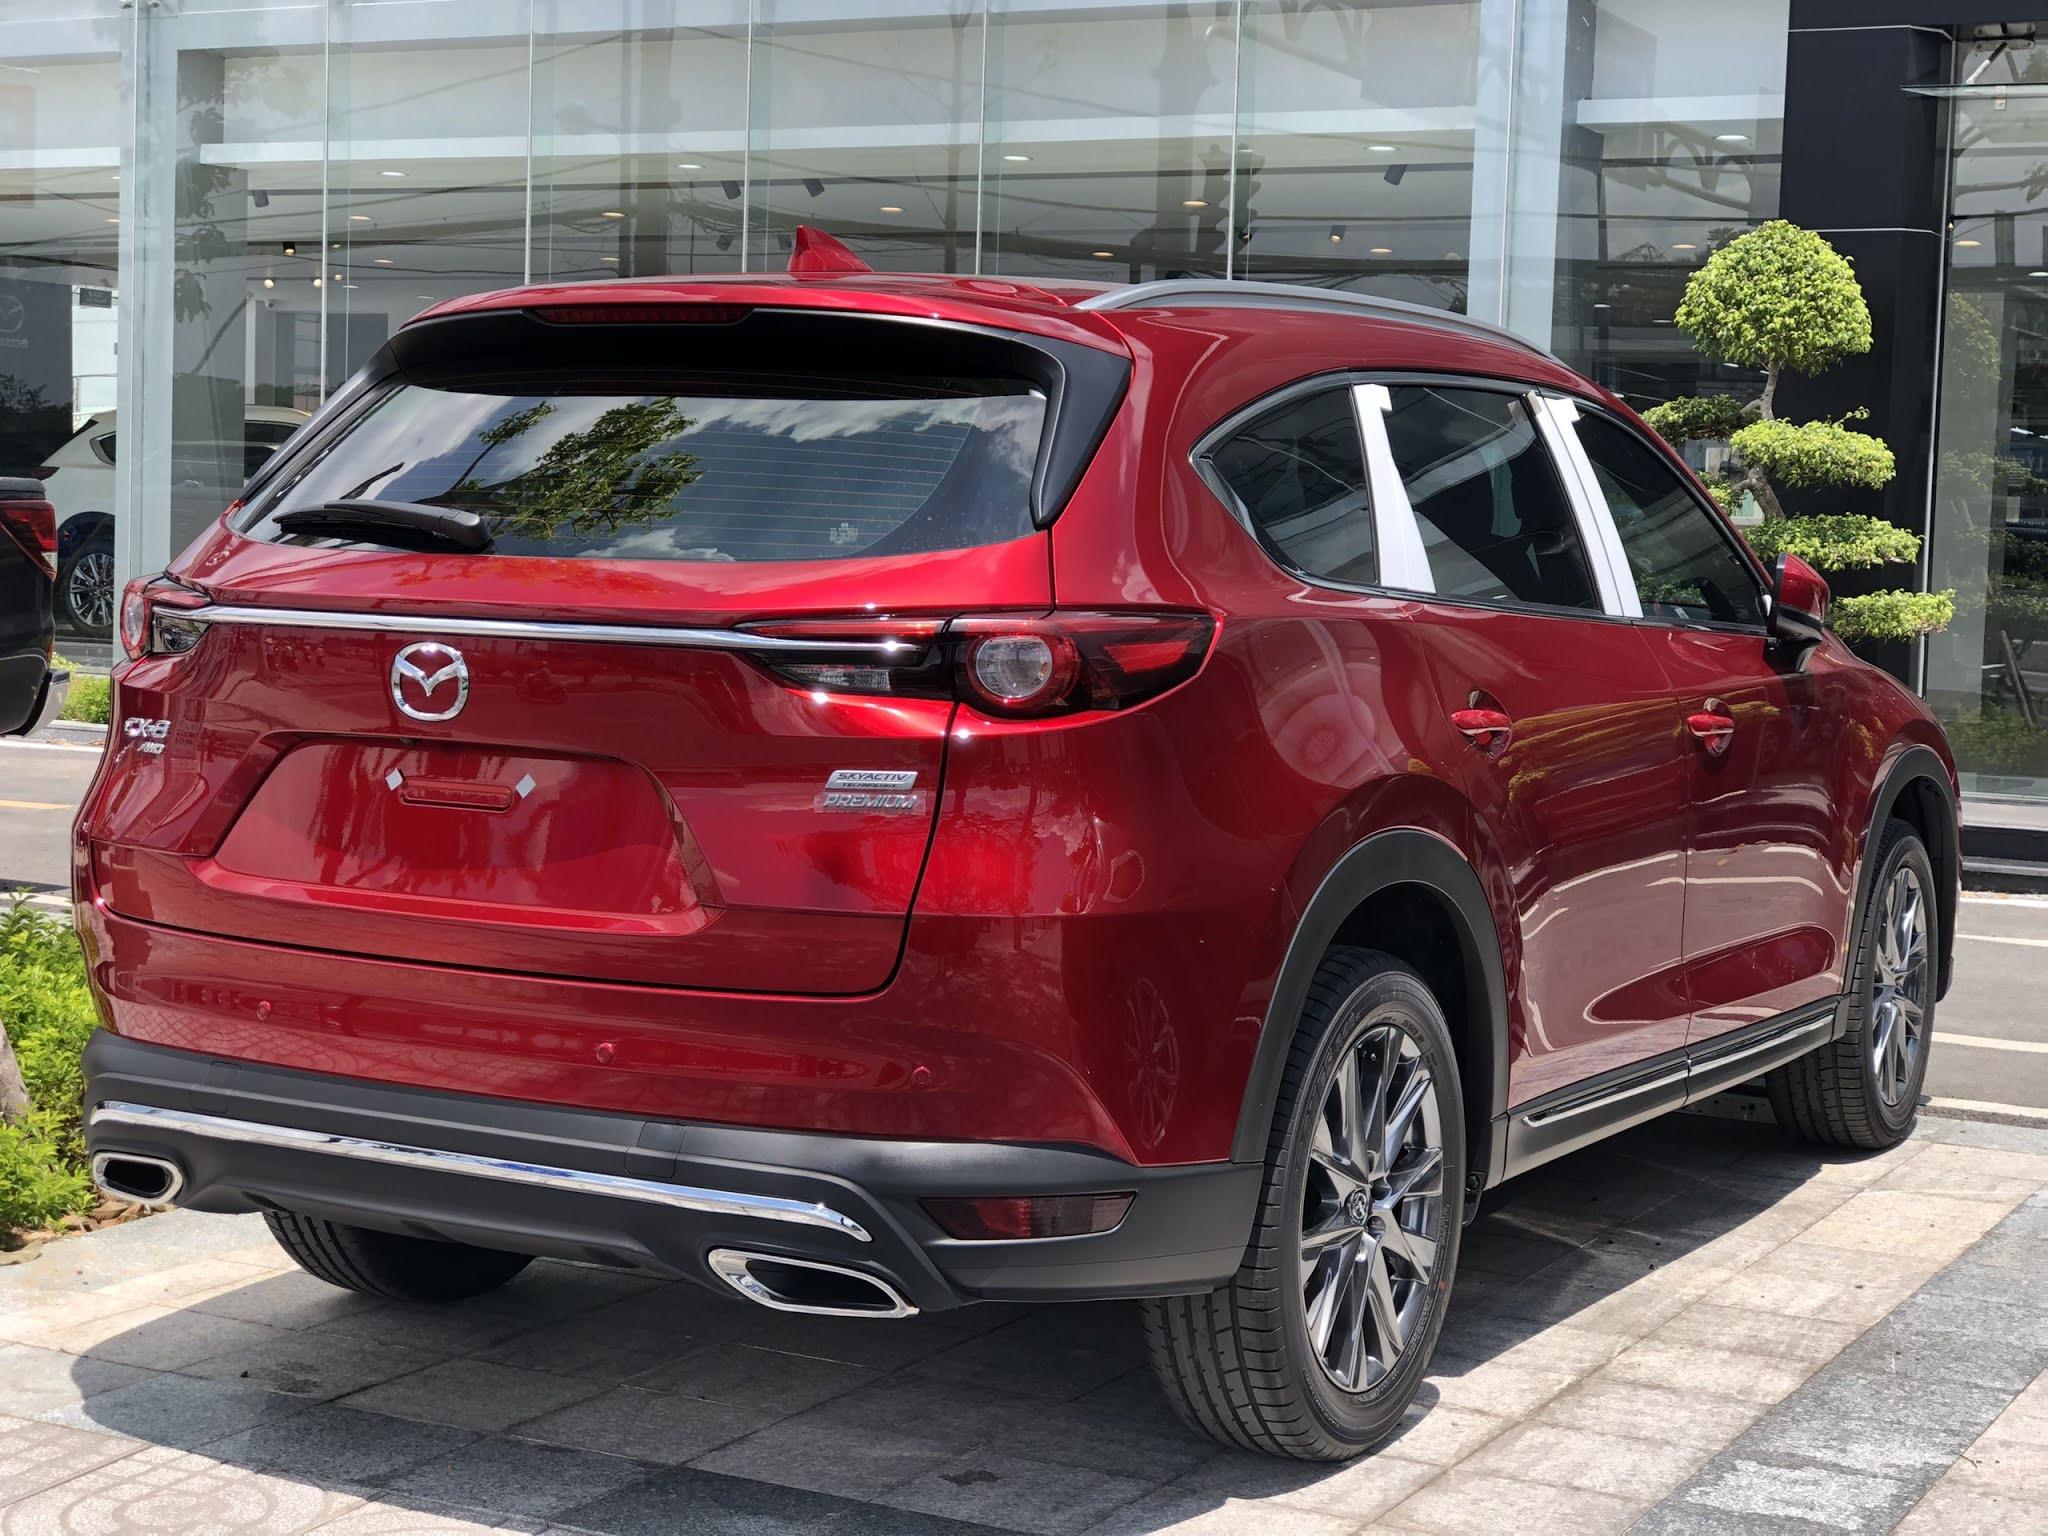 Mazda cx8 đỏ pha lê 46v